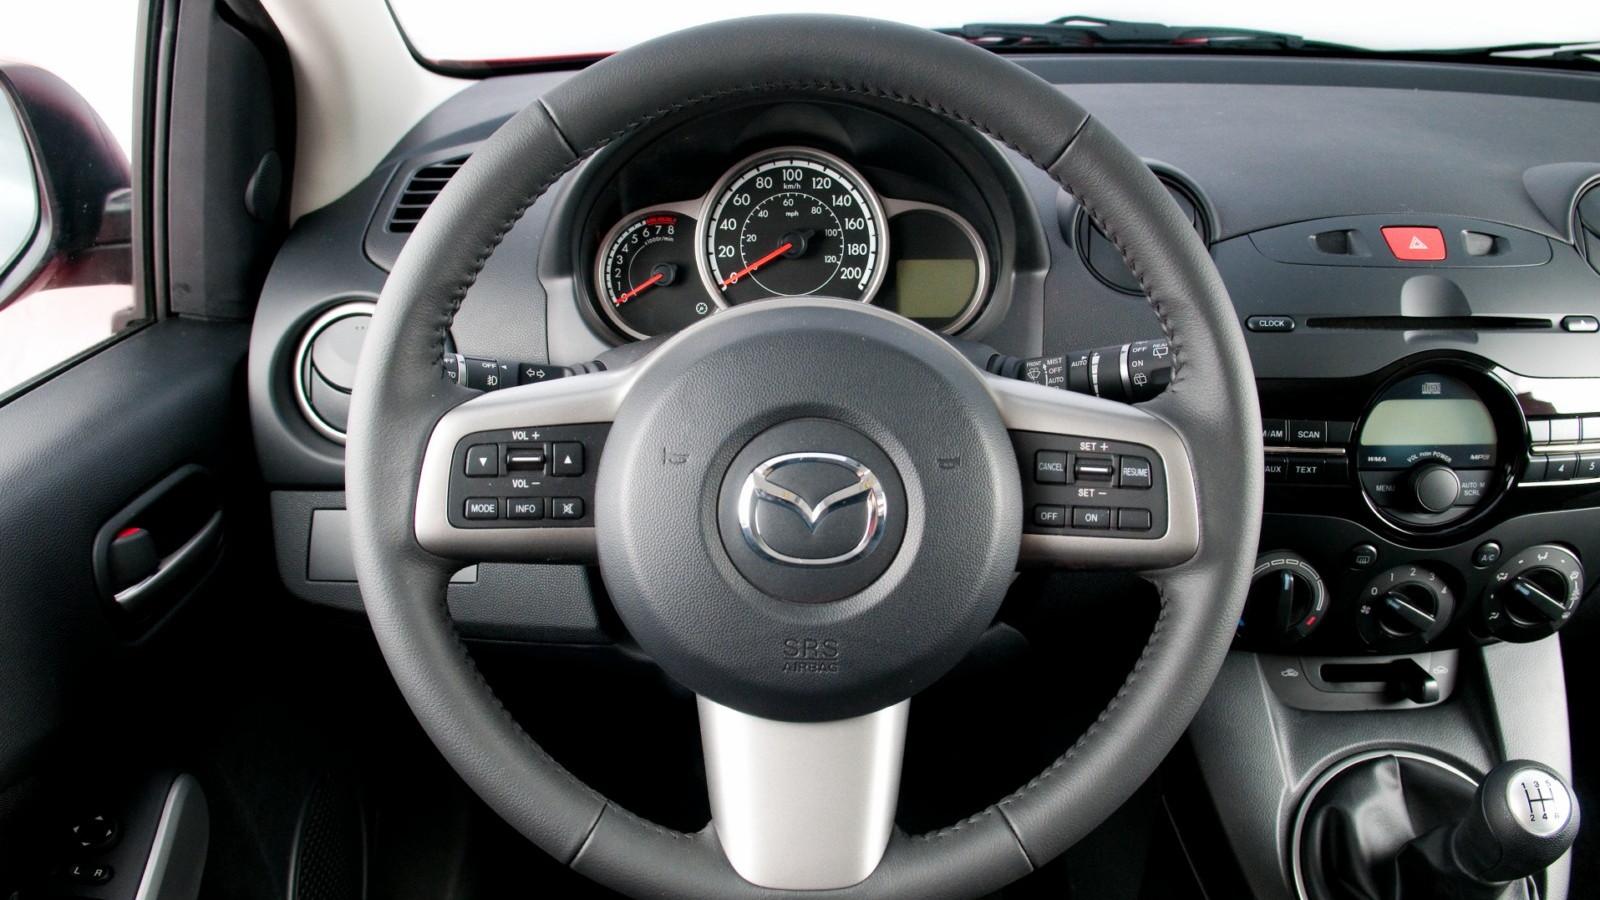 2011 Mazda2 interior